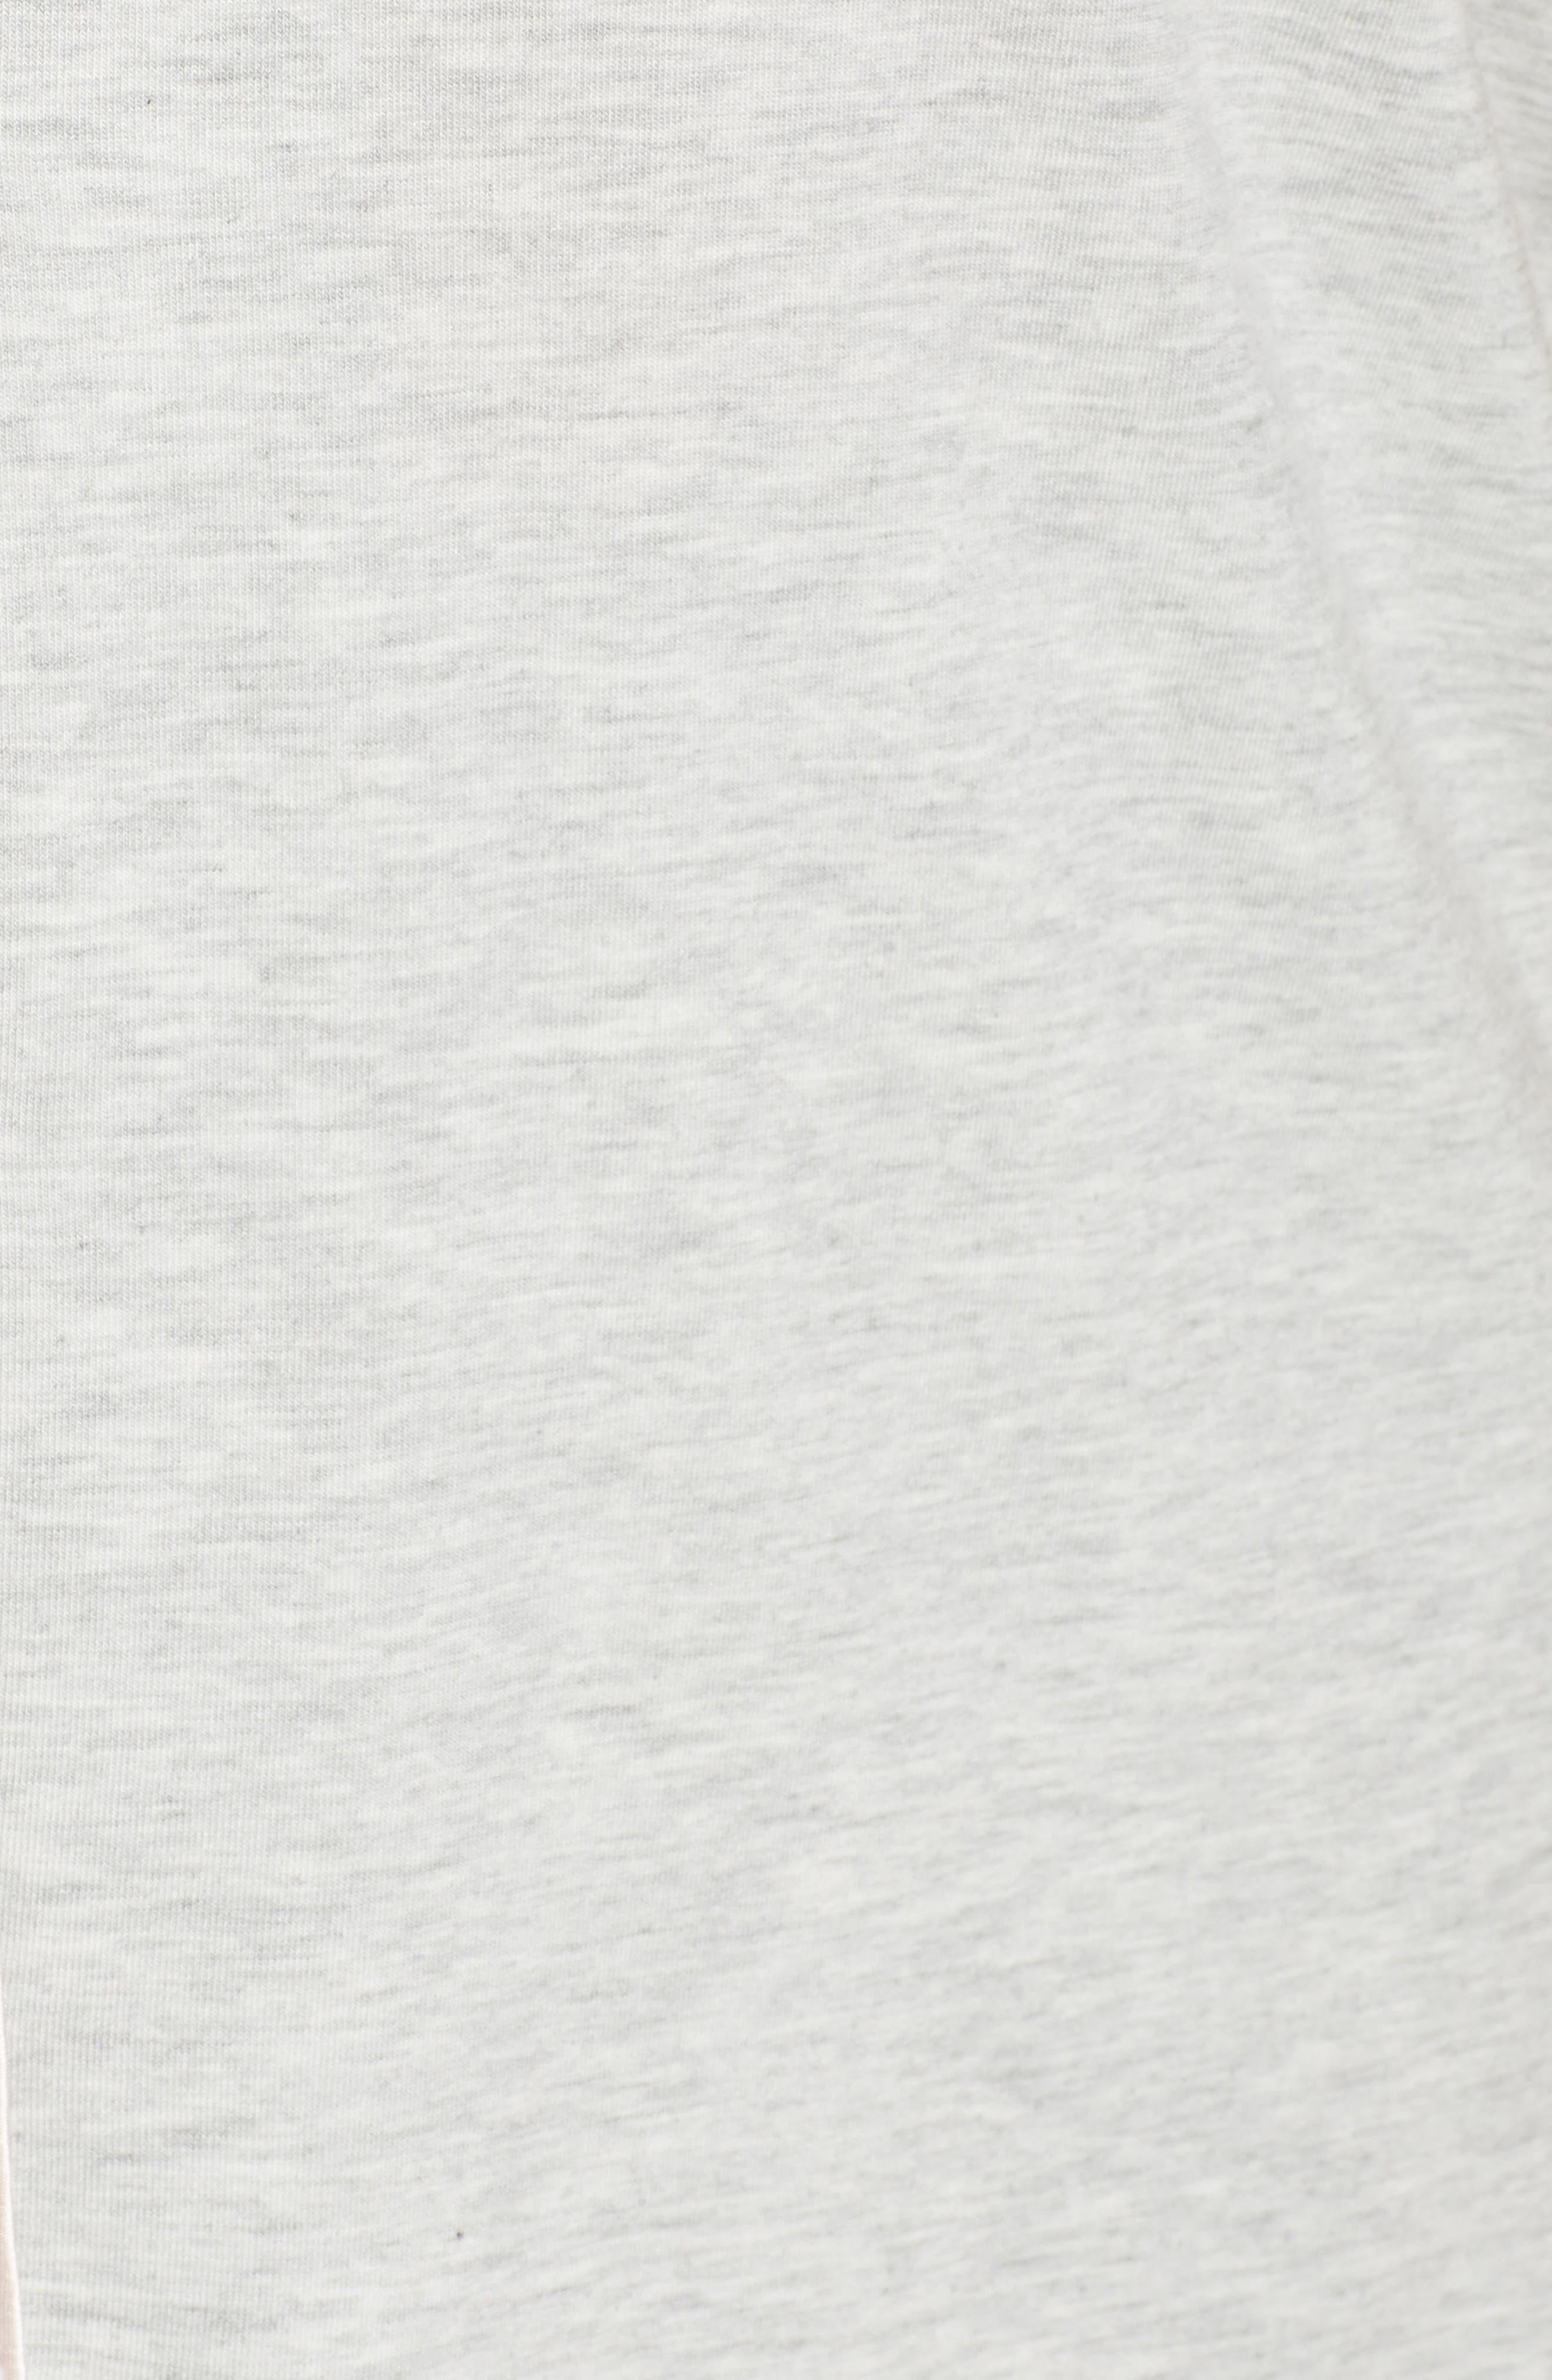 NORDSTROM LINGERIE, Moonlight Short Pajamas, Alternate thumbnail 5, color, GREY PEARL HEATHER